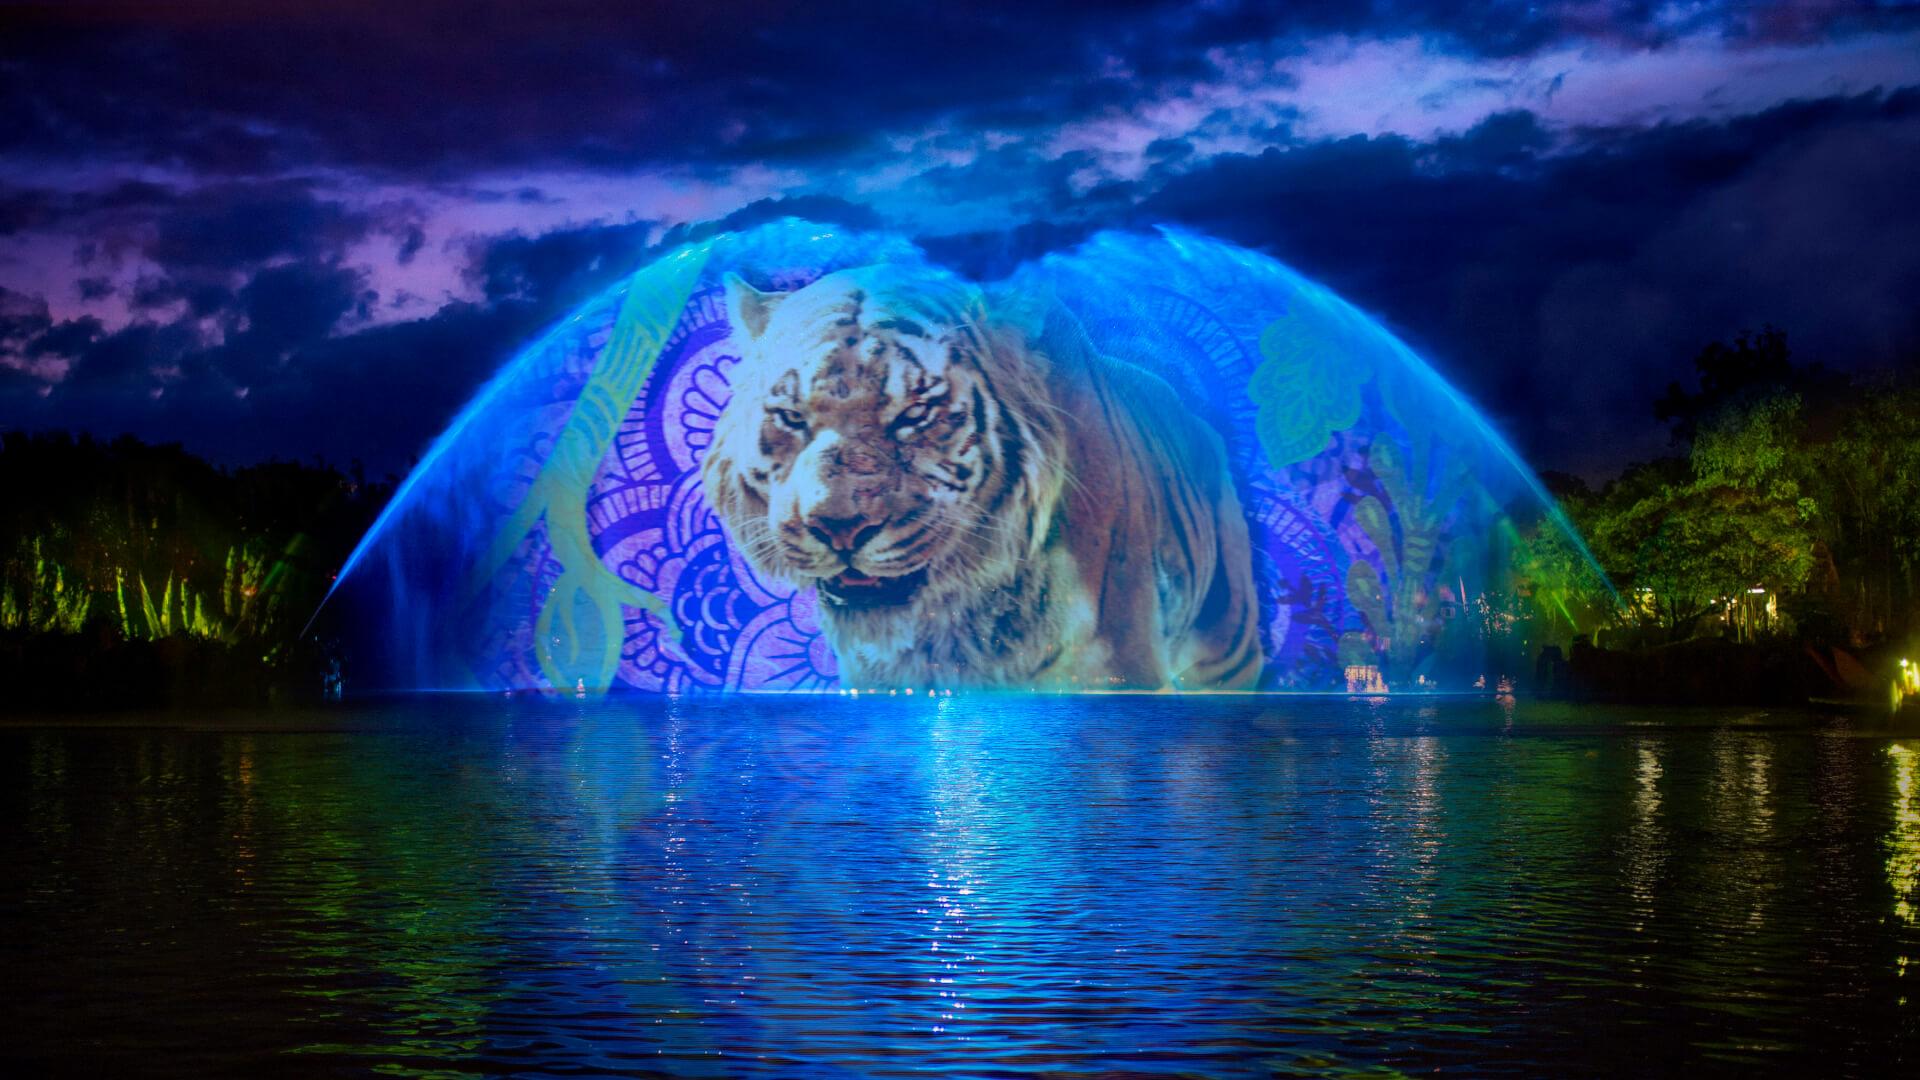 New Night Experiences At Disneys Animal Kingdom Kicking Off May 27 The Jungle Book Show Begins 28